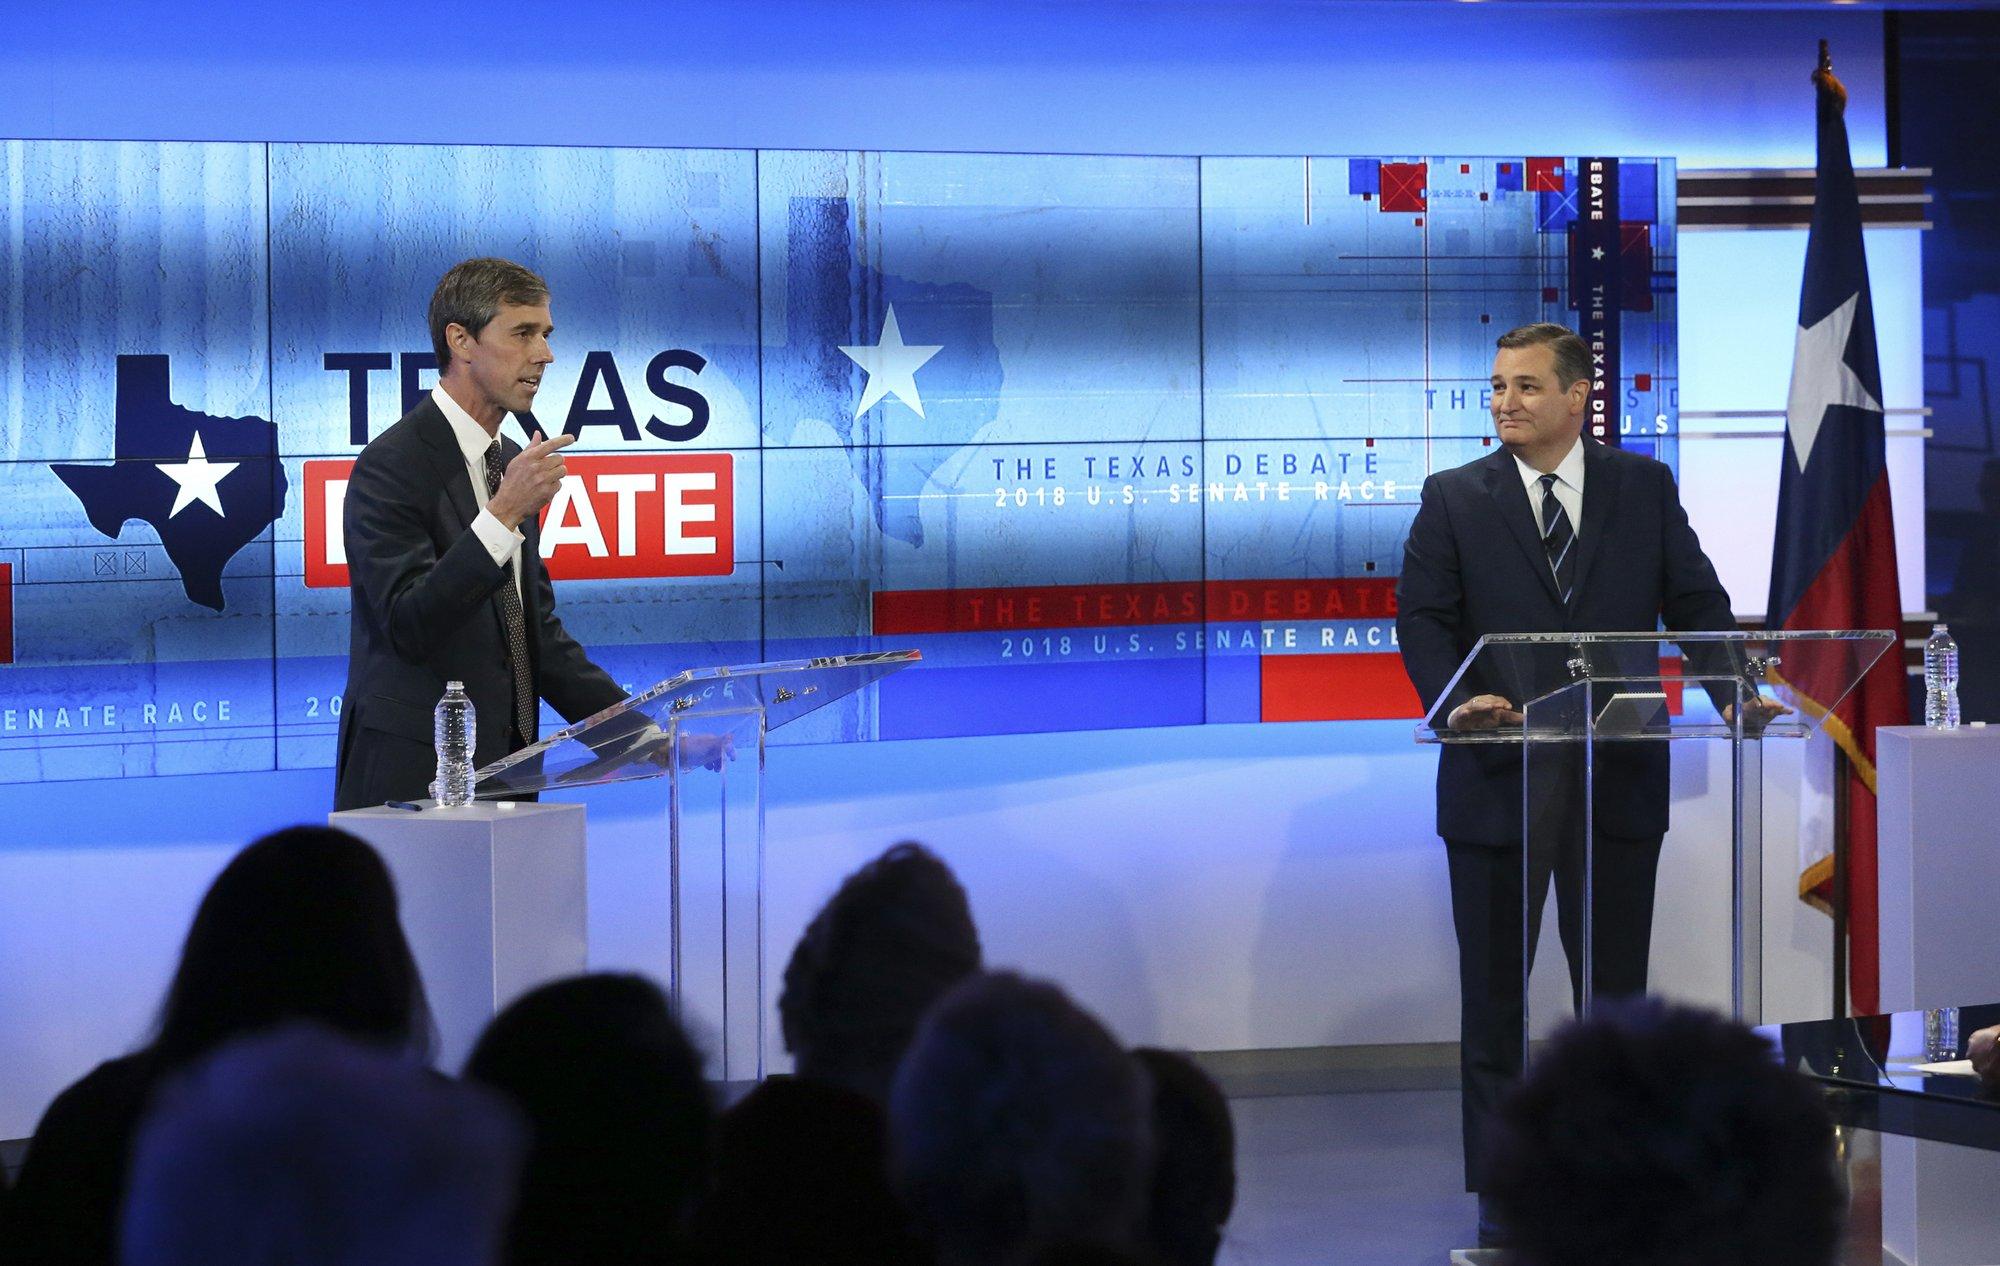 Trailing in polls, O'Rourke lays into Cruz in Texas debate